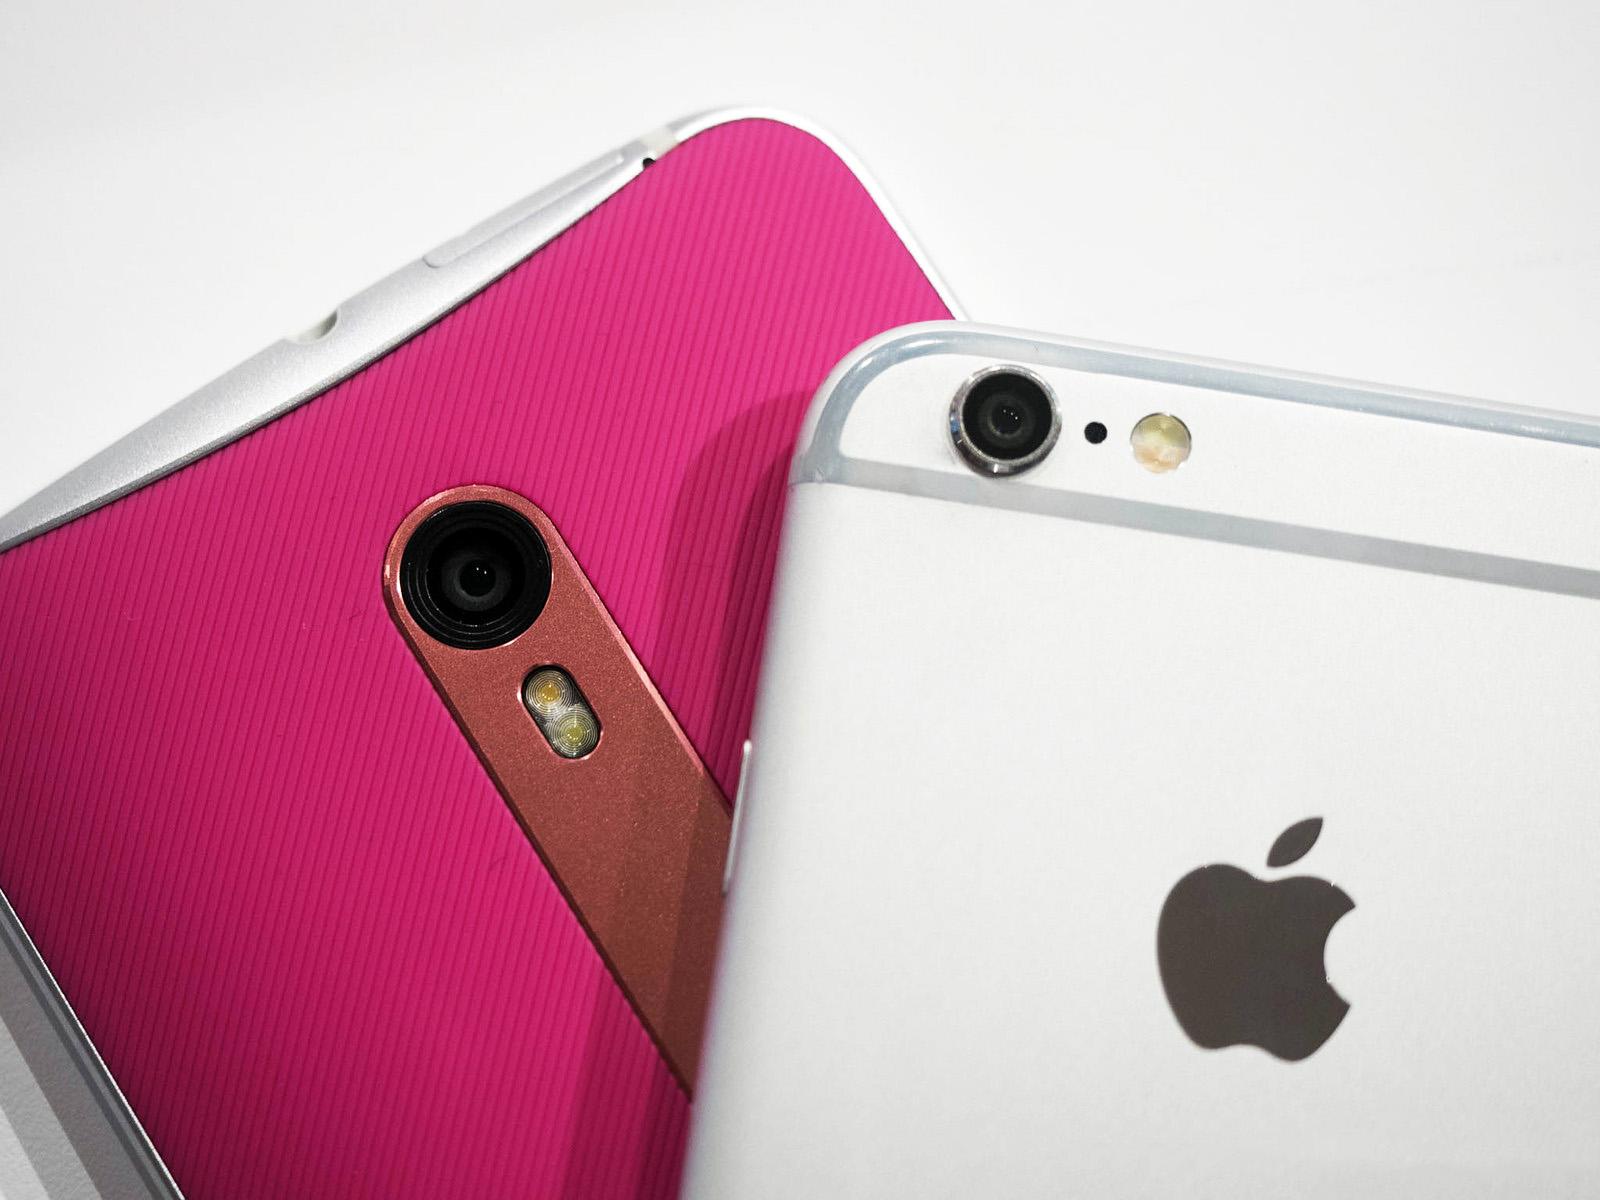 moto-x-style-vs-iphone-6-backs